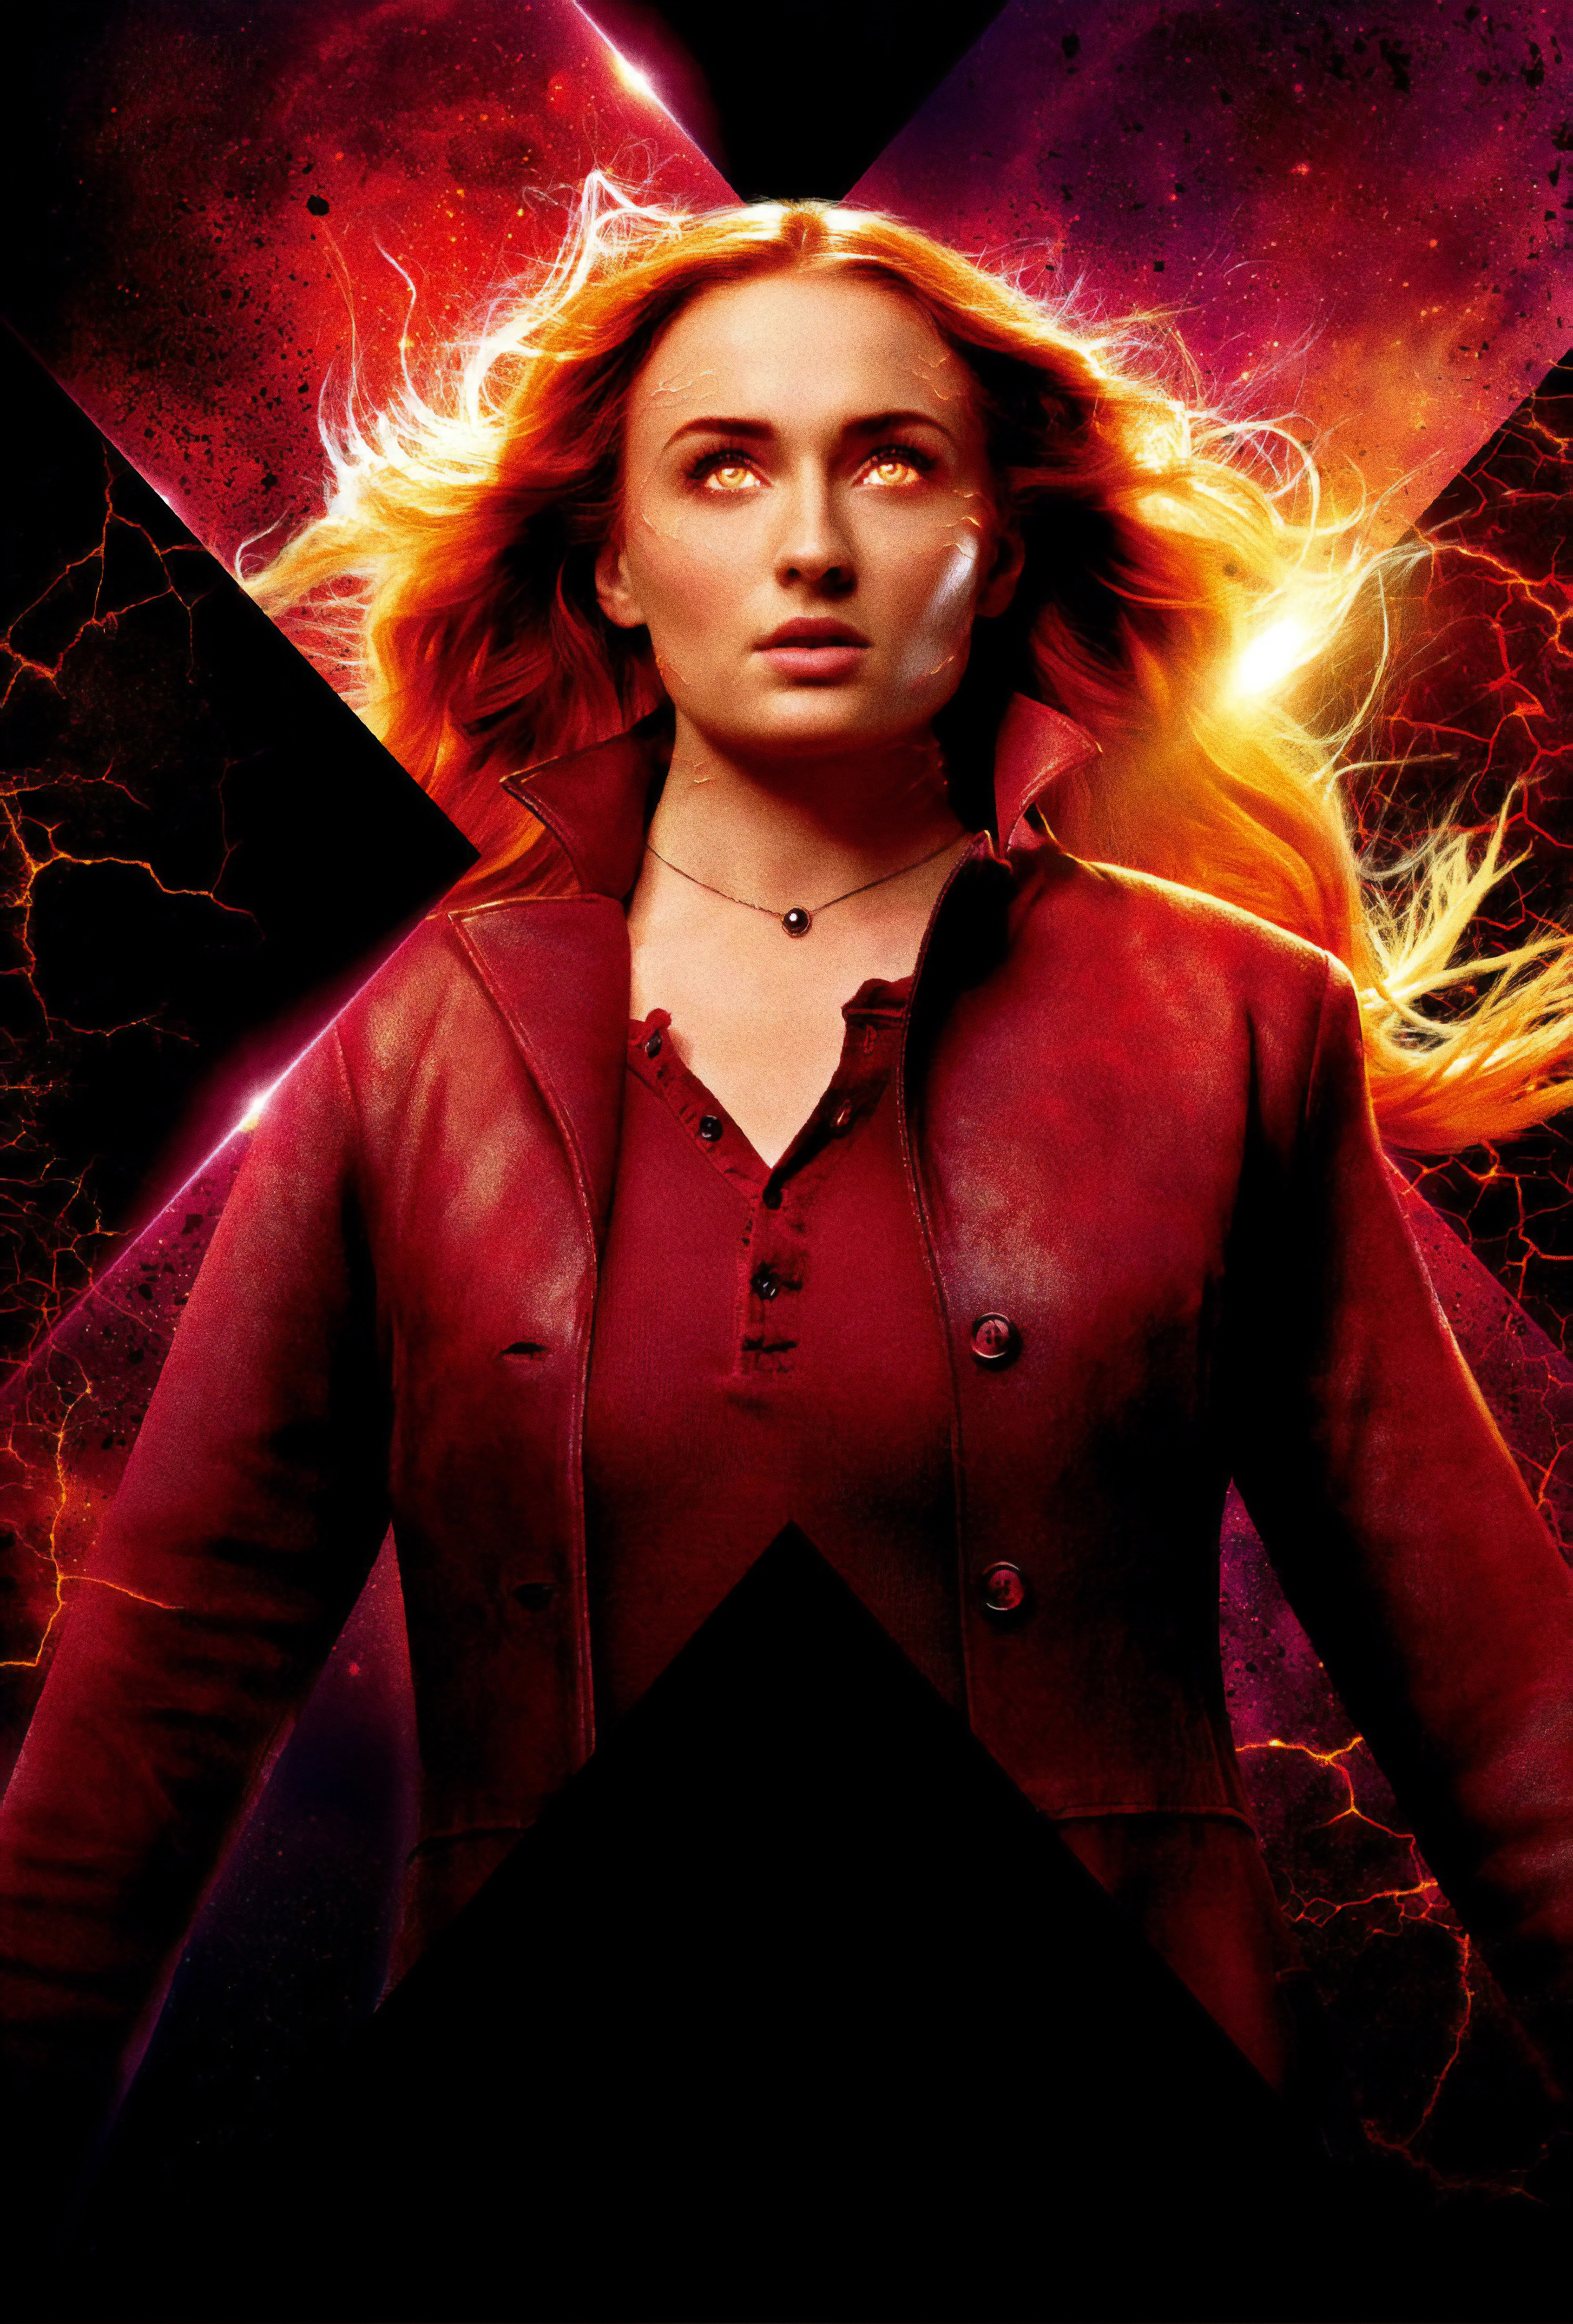 Sophie Turner Dark Phoenix 2019 Movie Wallpaper Hd Movies